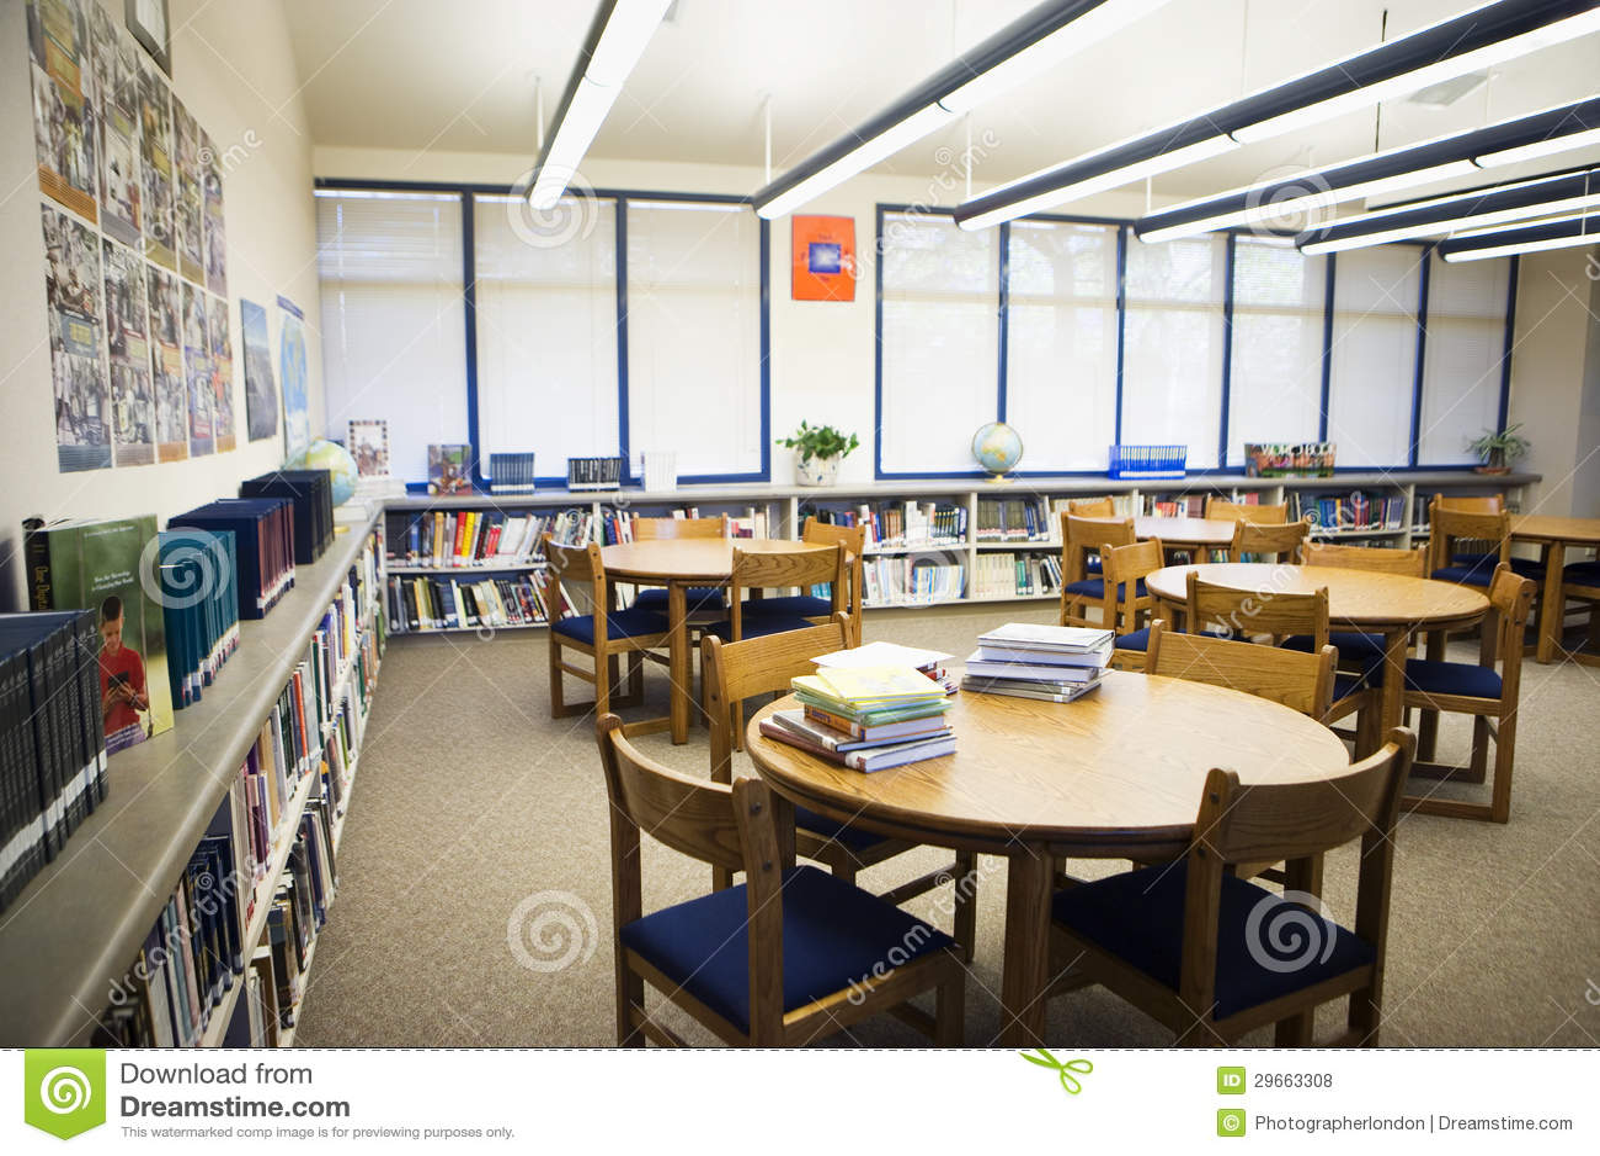 School Furniture Library Bookshelf Bookcase Design